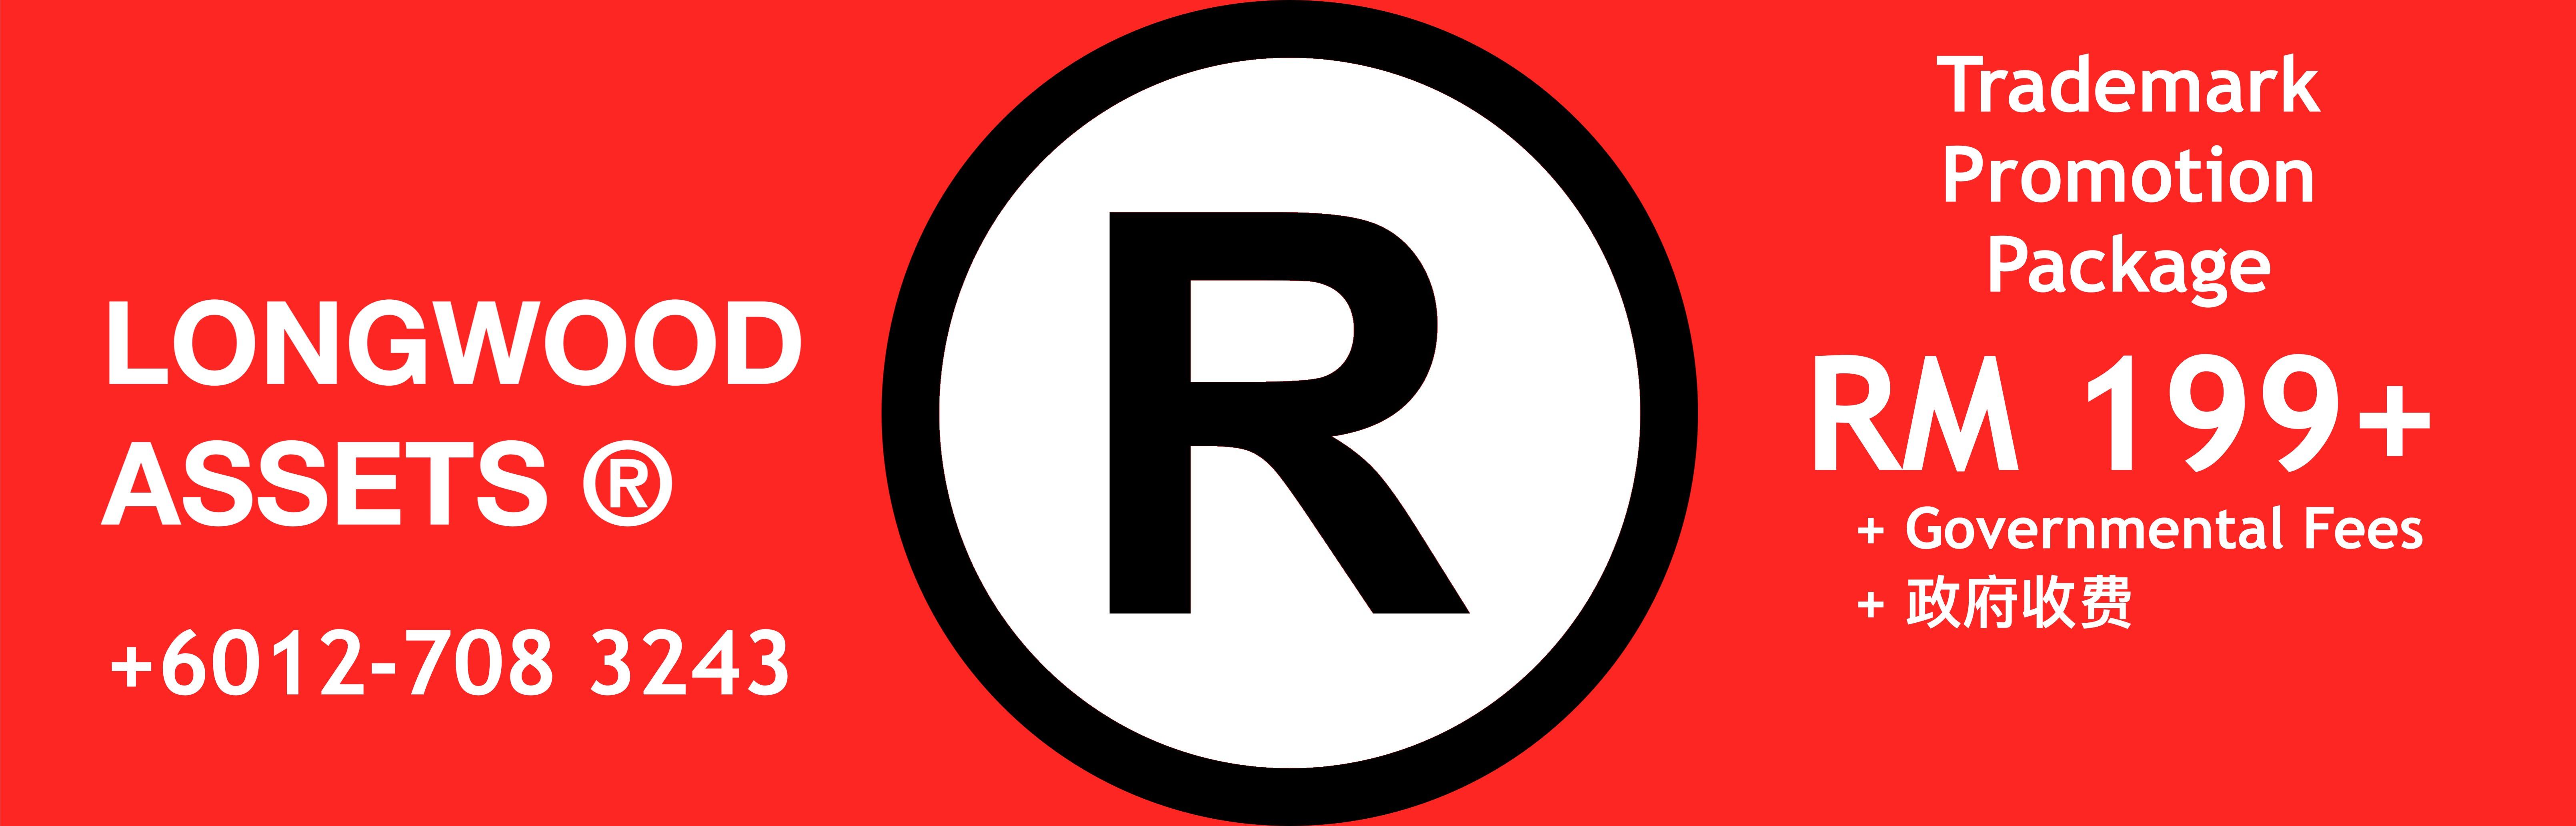 Trademark Registration Malaysia